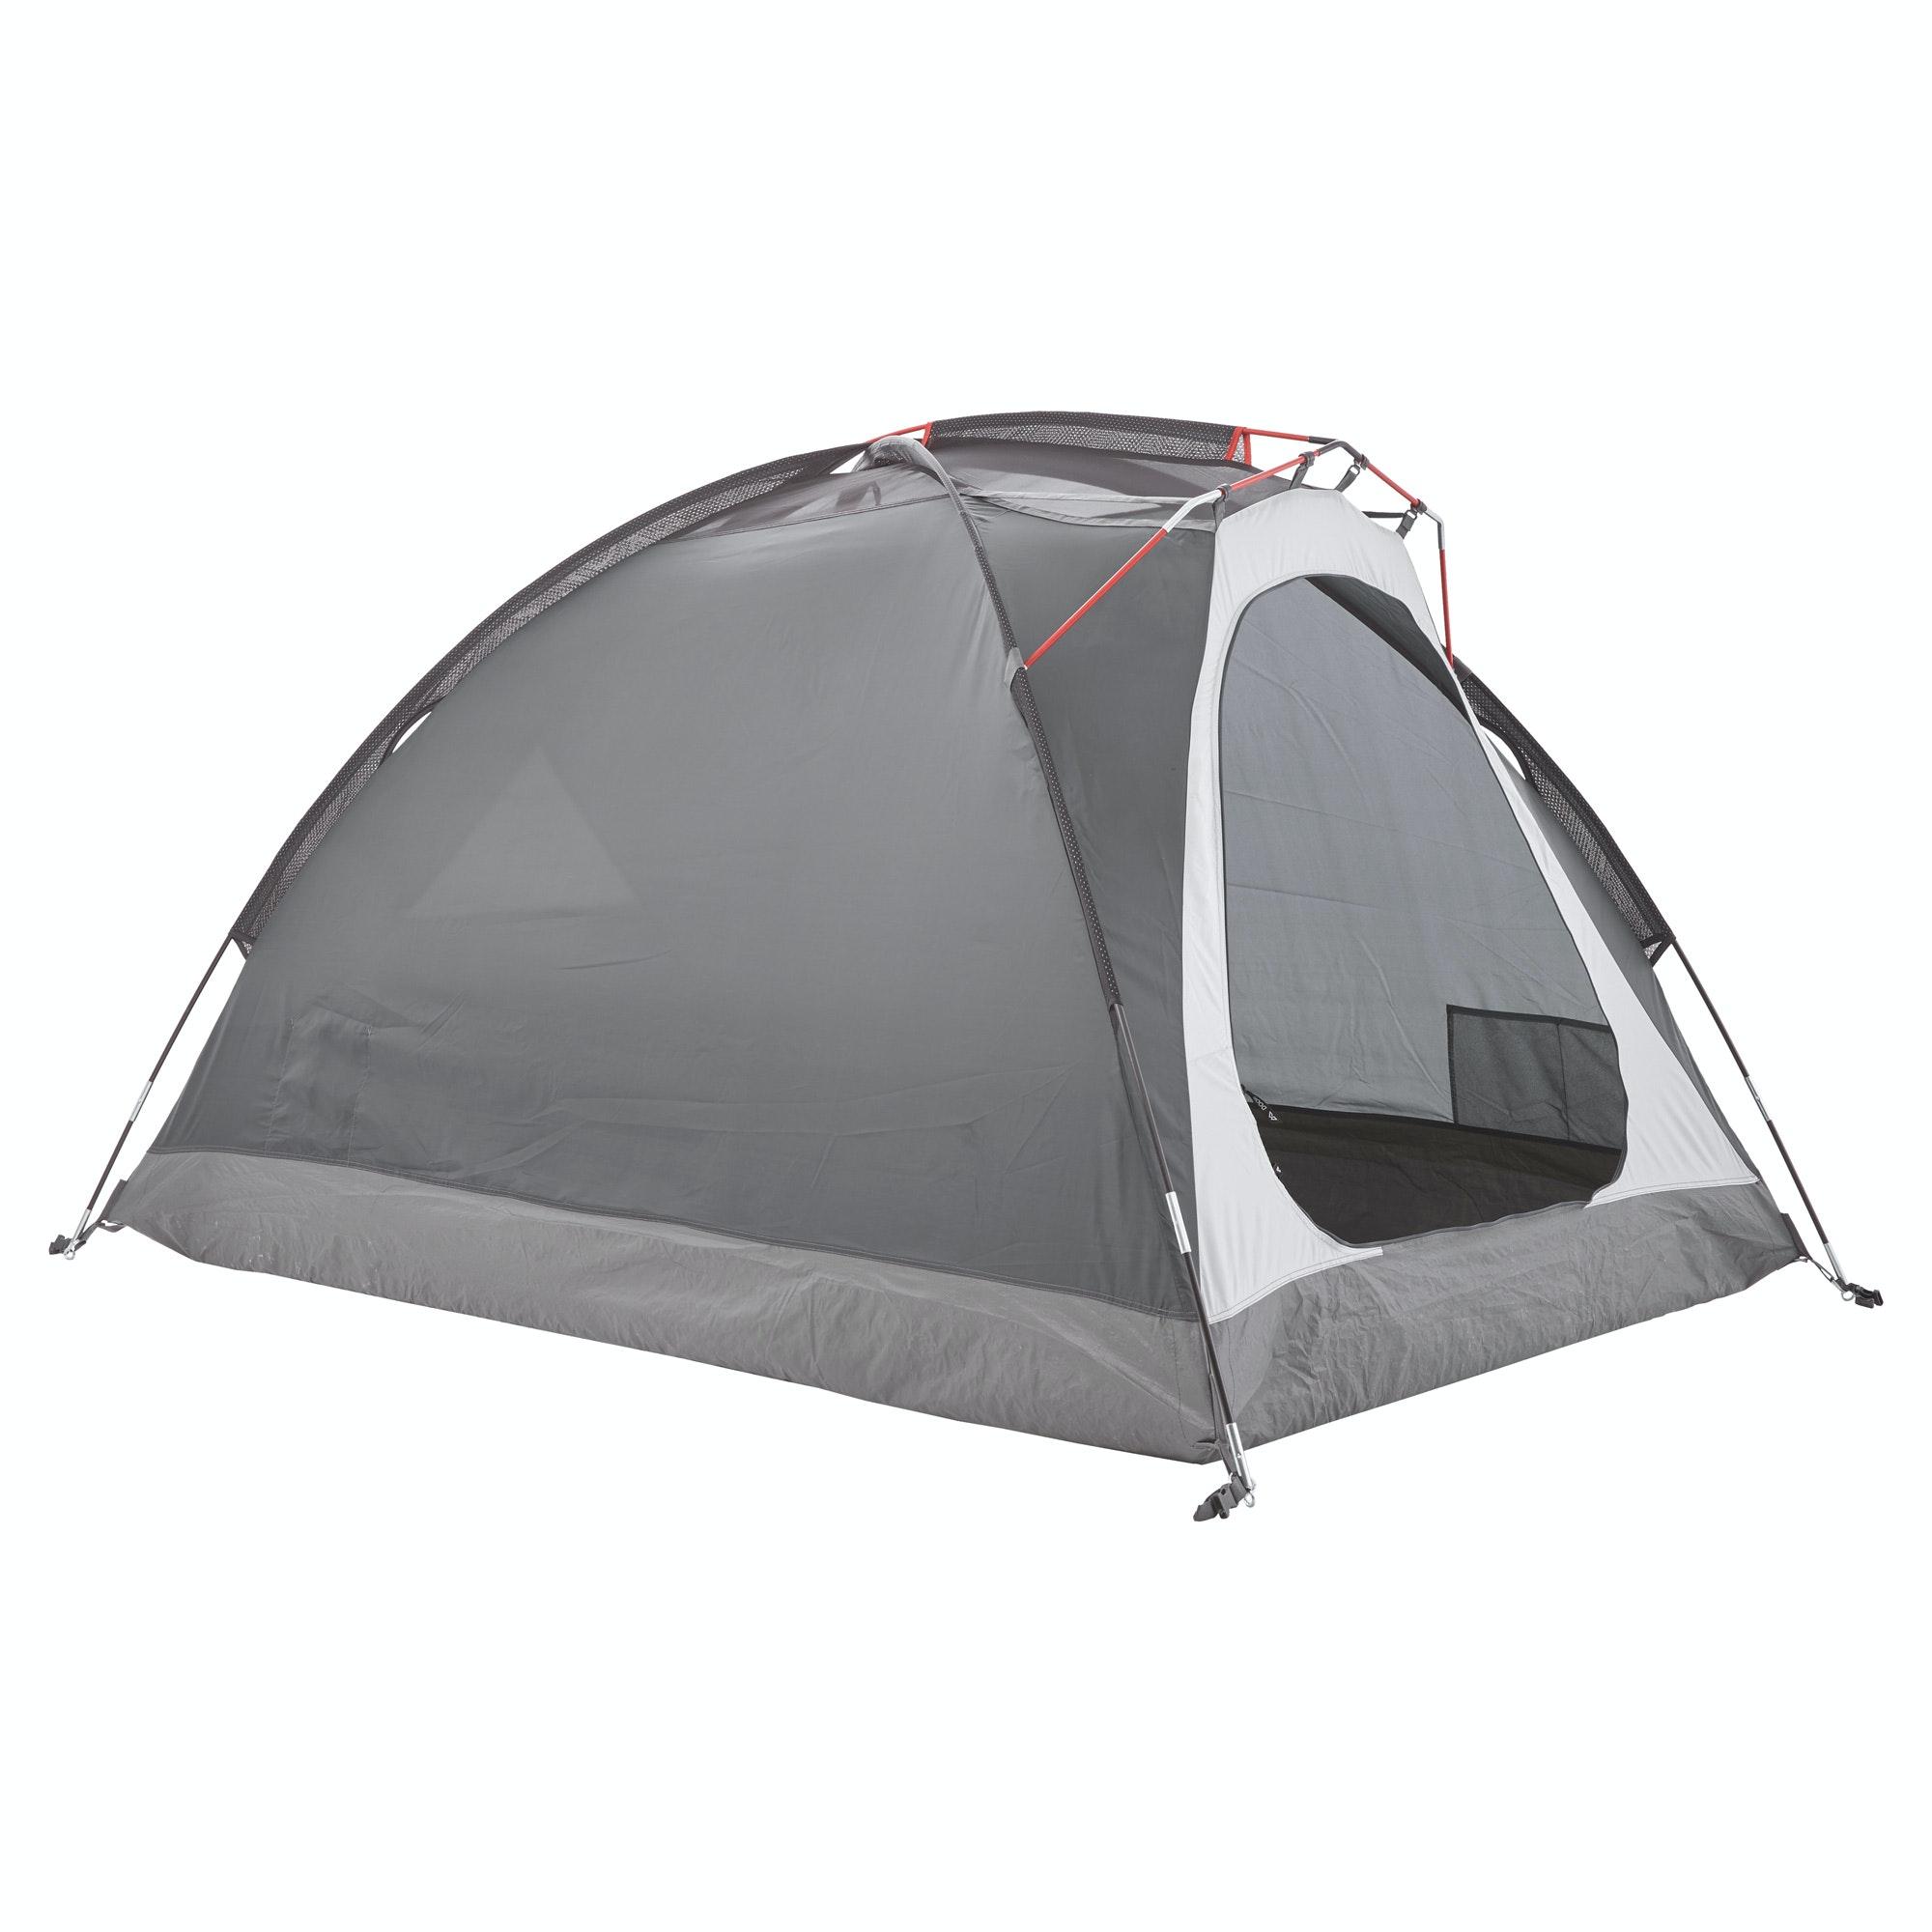 NEW-Kathmandu-Retreat-40-2-Person-Waterproof-Compact-Camping-Hiking-Tent thumbnail 10